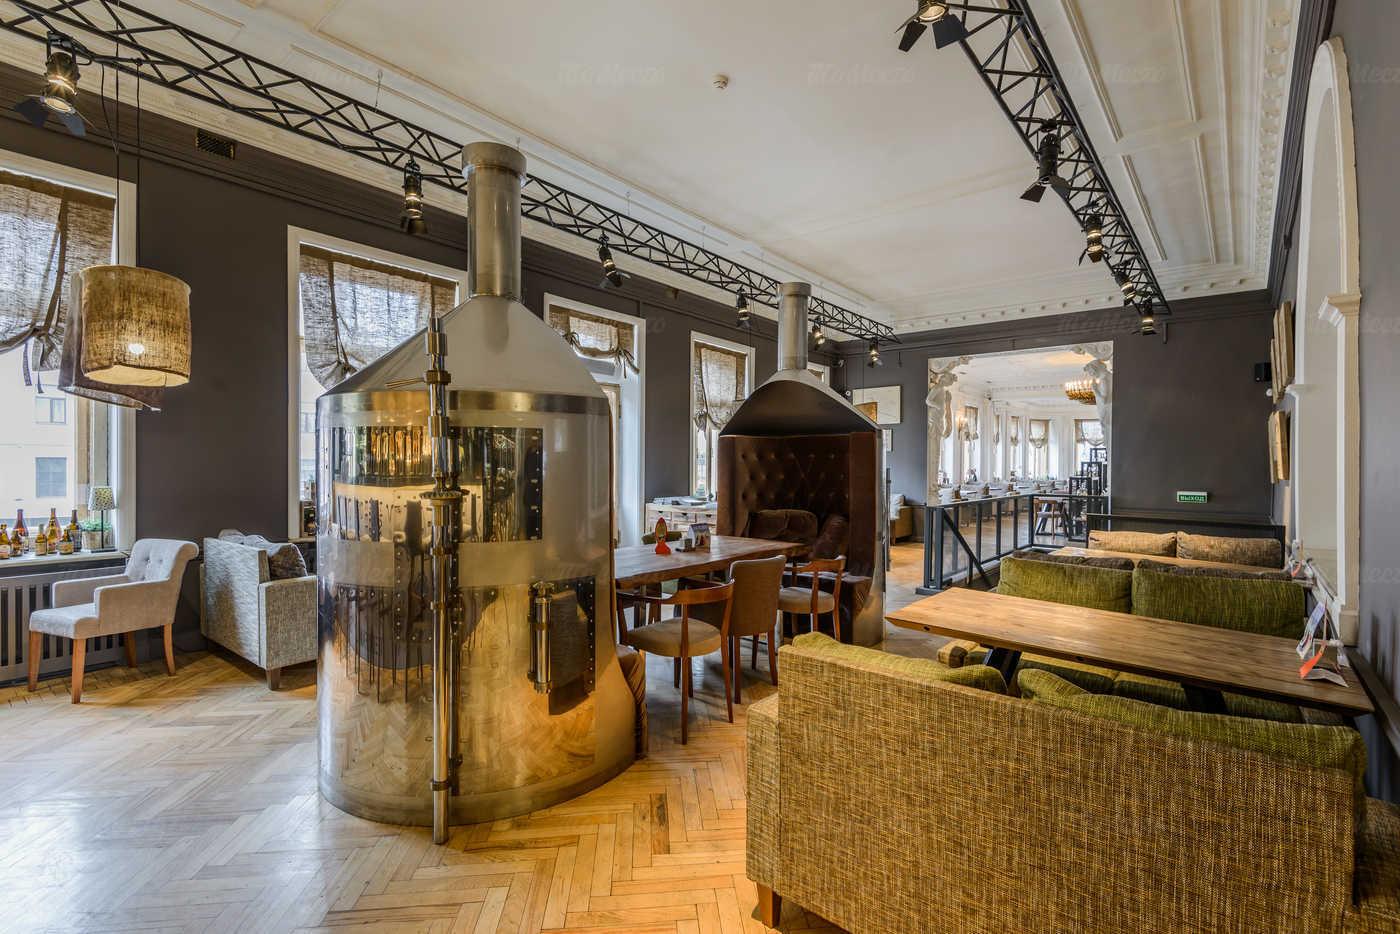 Ресторан Шато Винтаж (Chateau Vintage) на Невском проспекте фото 5